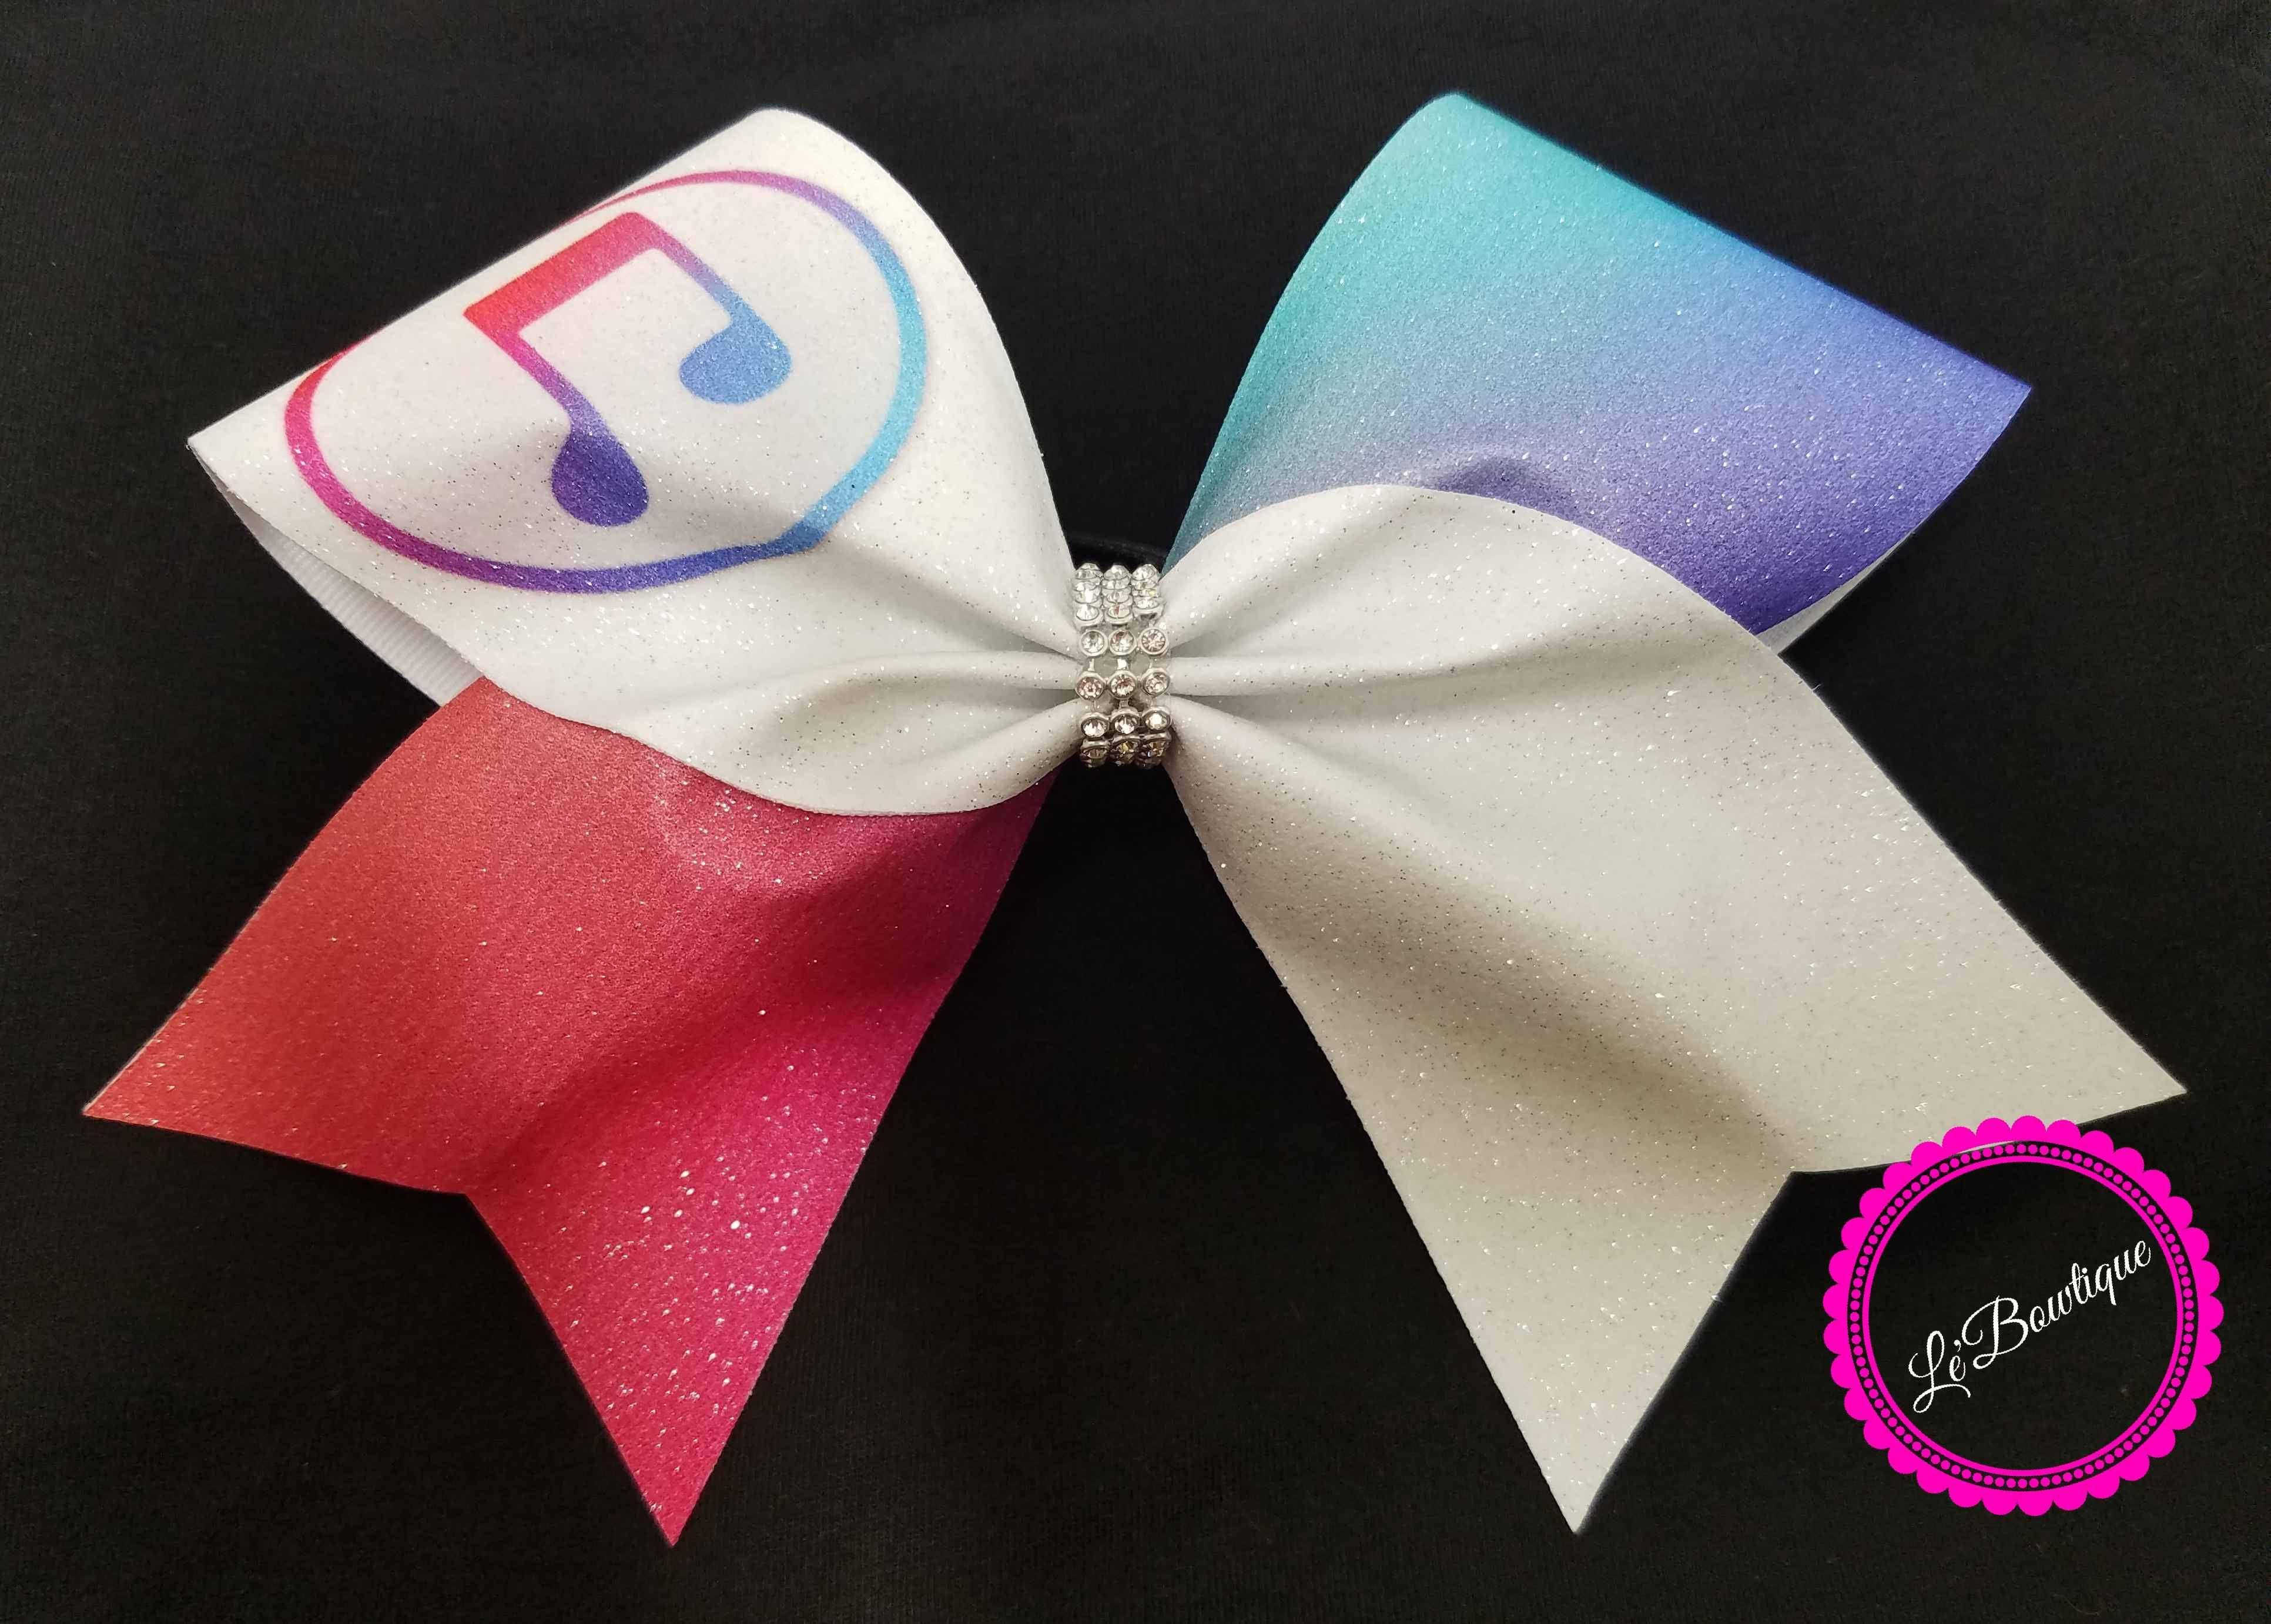 9c519cf8bbfa iTunes Glitter Cheer Bow in 2019 | love | Cheer bows, Bows, Cheer